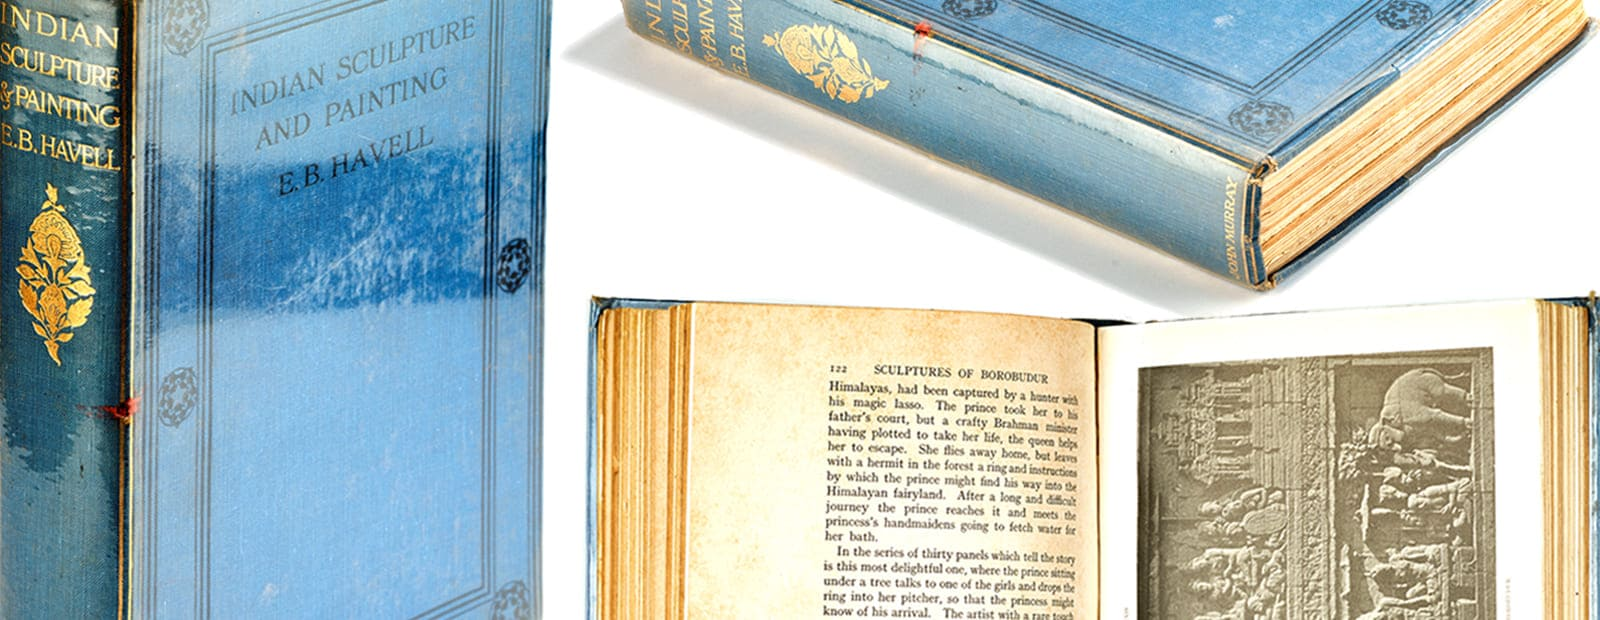 Rare Books on Indian Art & Culture